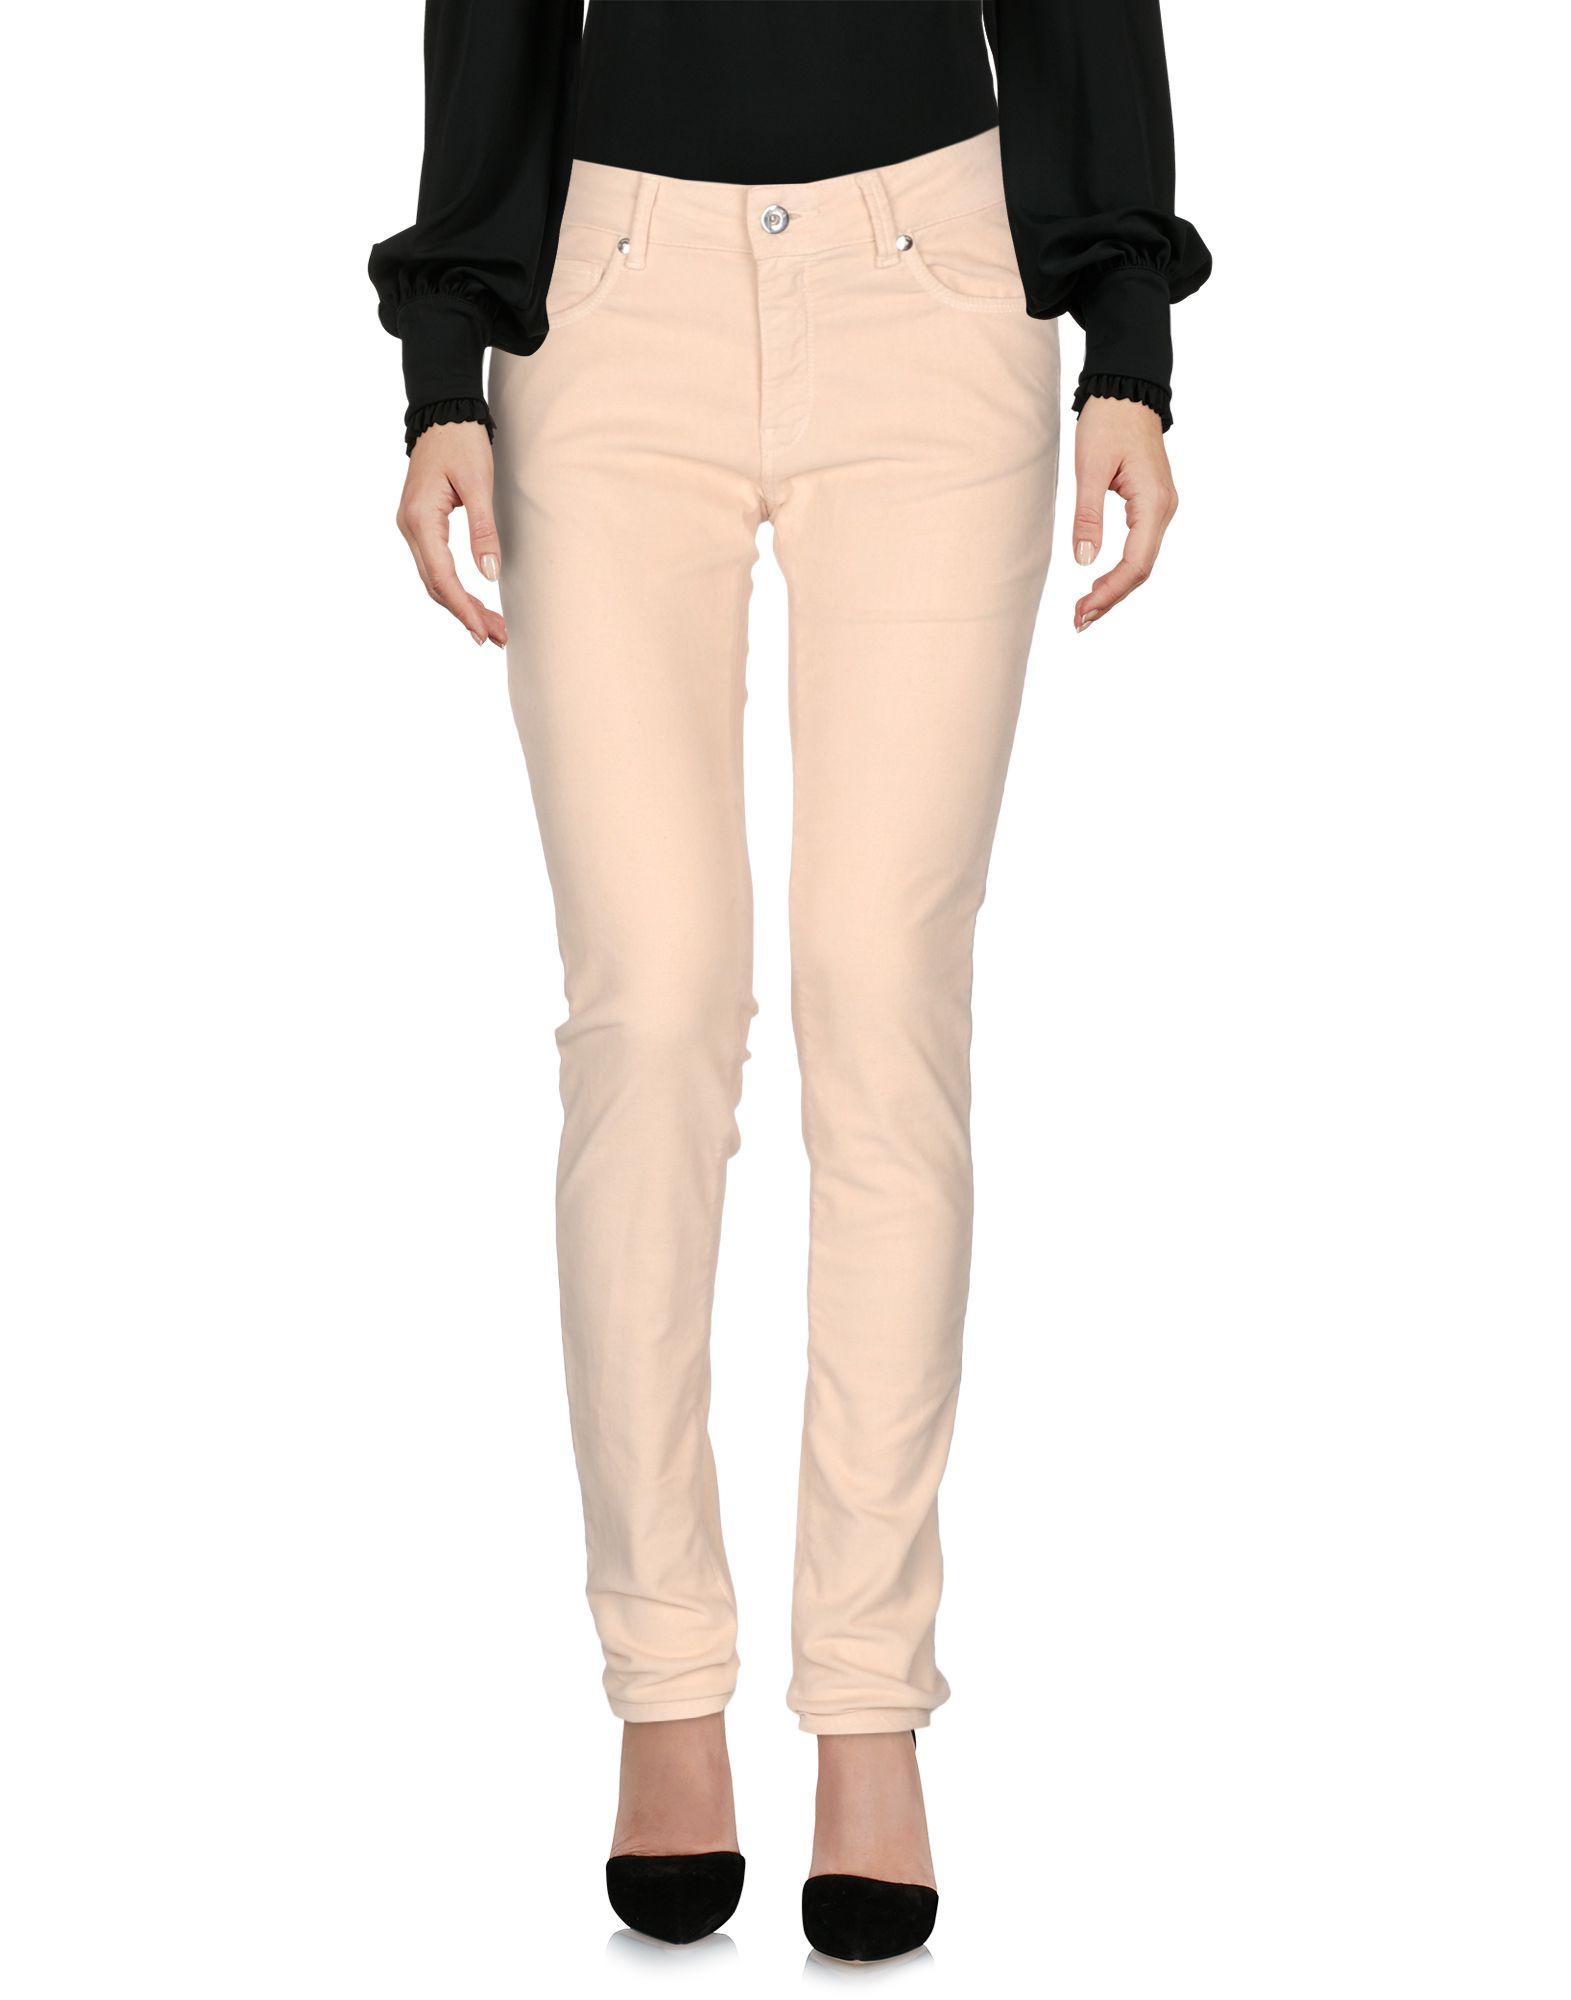 Pantalone Pianurastudio donna - 13075905TK 13075905TK 13075905TK 719